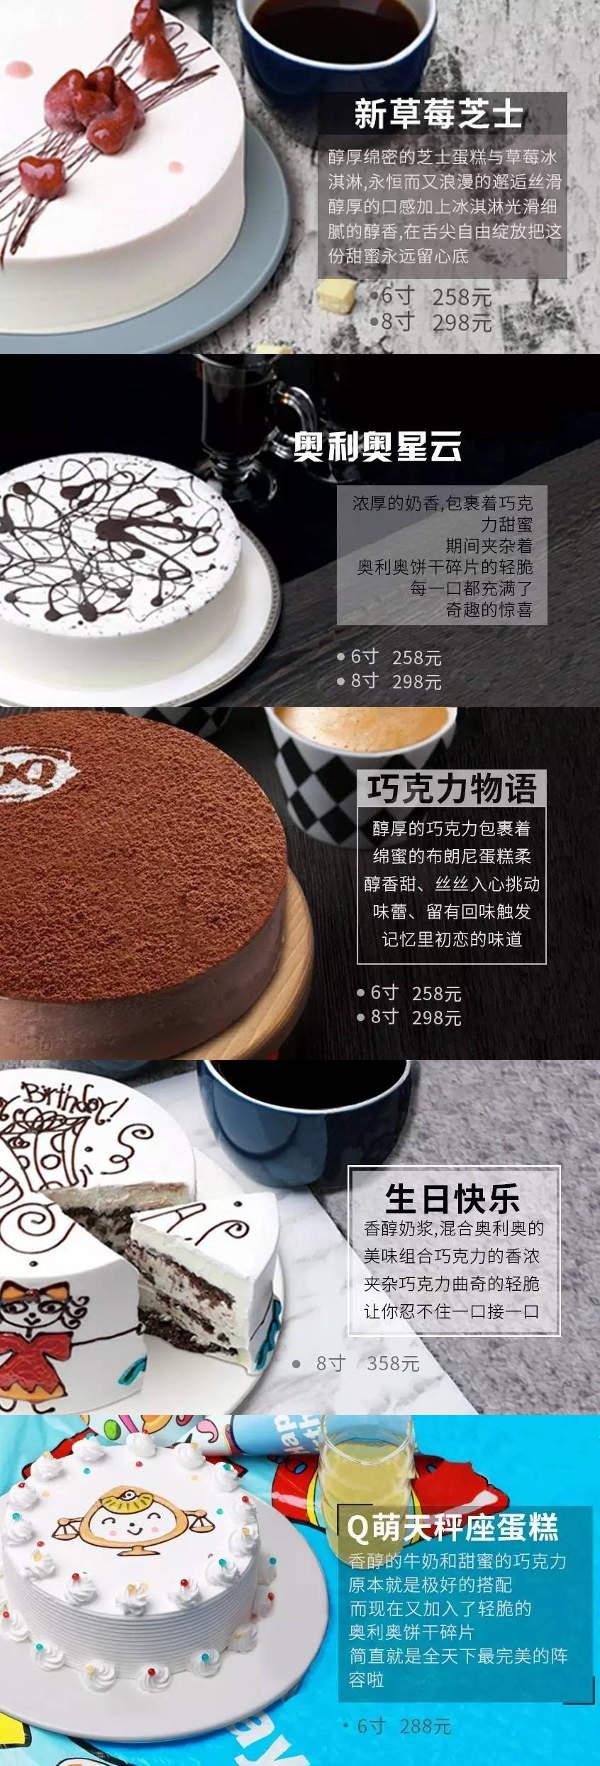 DQ五款冰淇淋蛋糕全新上市 有效期至:2016年12月31日 www.5ikfc.com